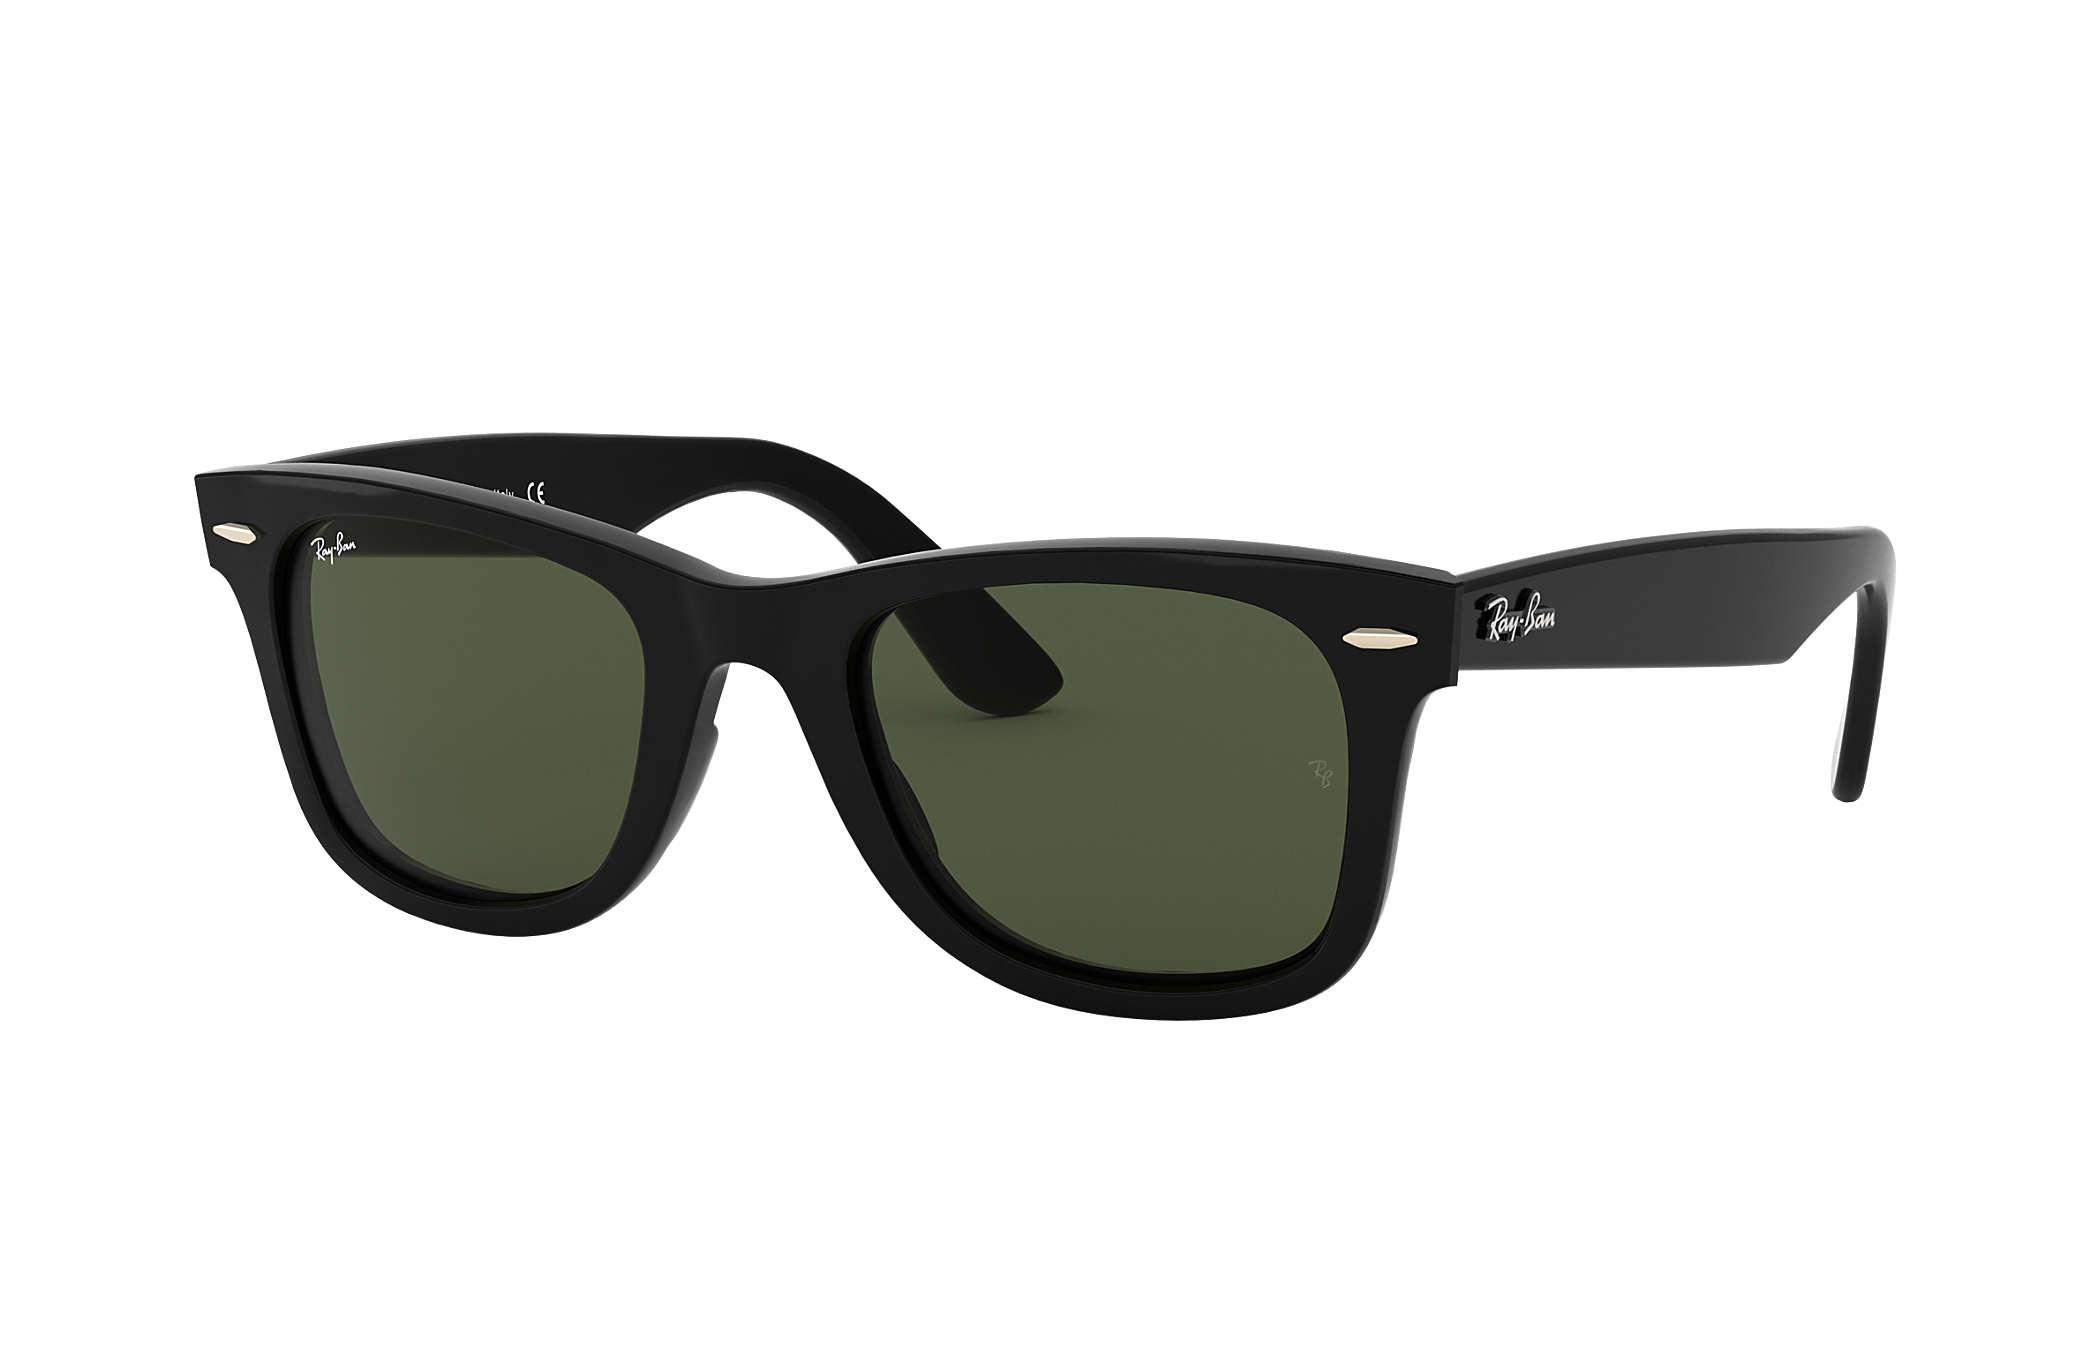 Ray-Ban Wayfarer Ease RB4340 Black - Injected - Green Lenses ... 8334da636158